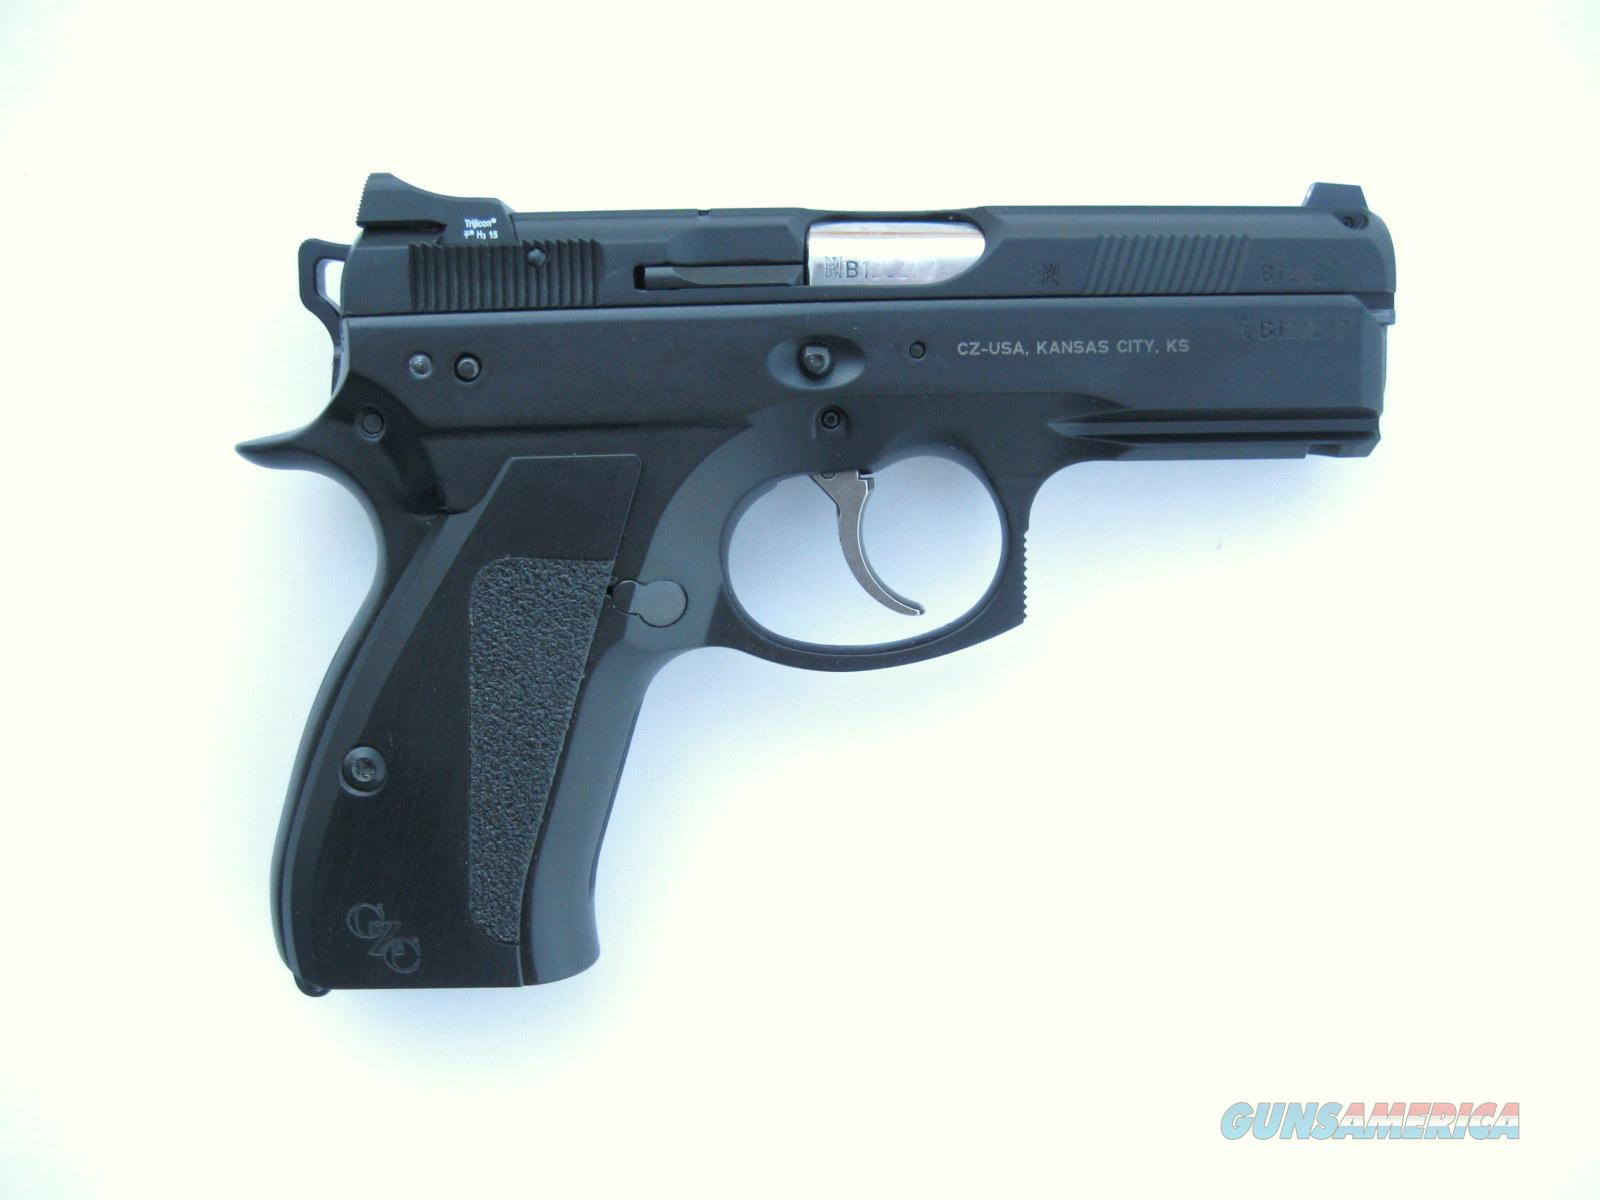 cz sdp p01 custom compact 75d 9mm decocker sights userimages